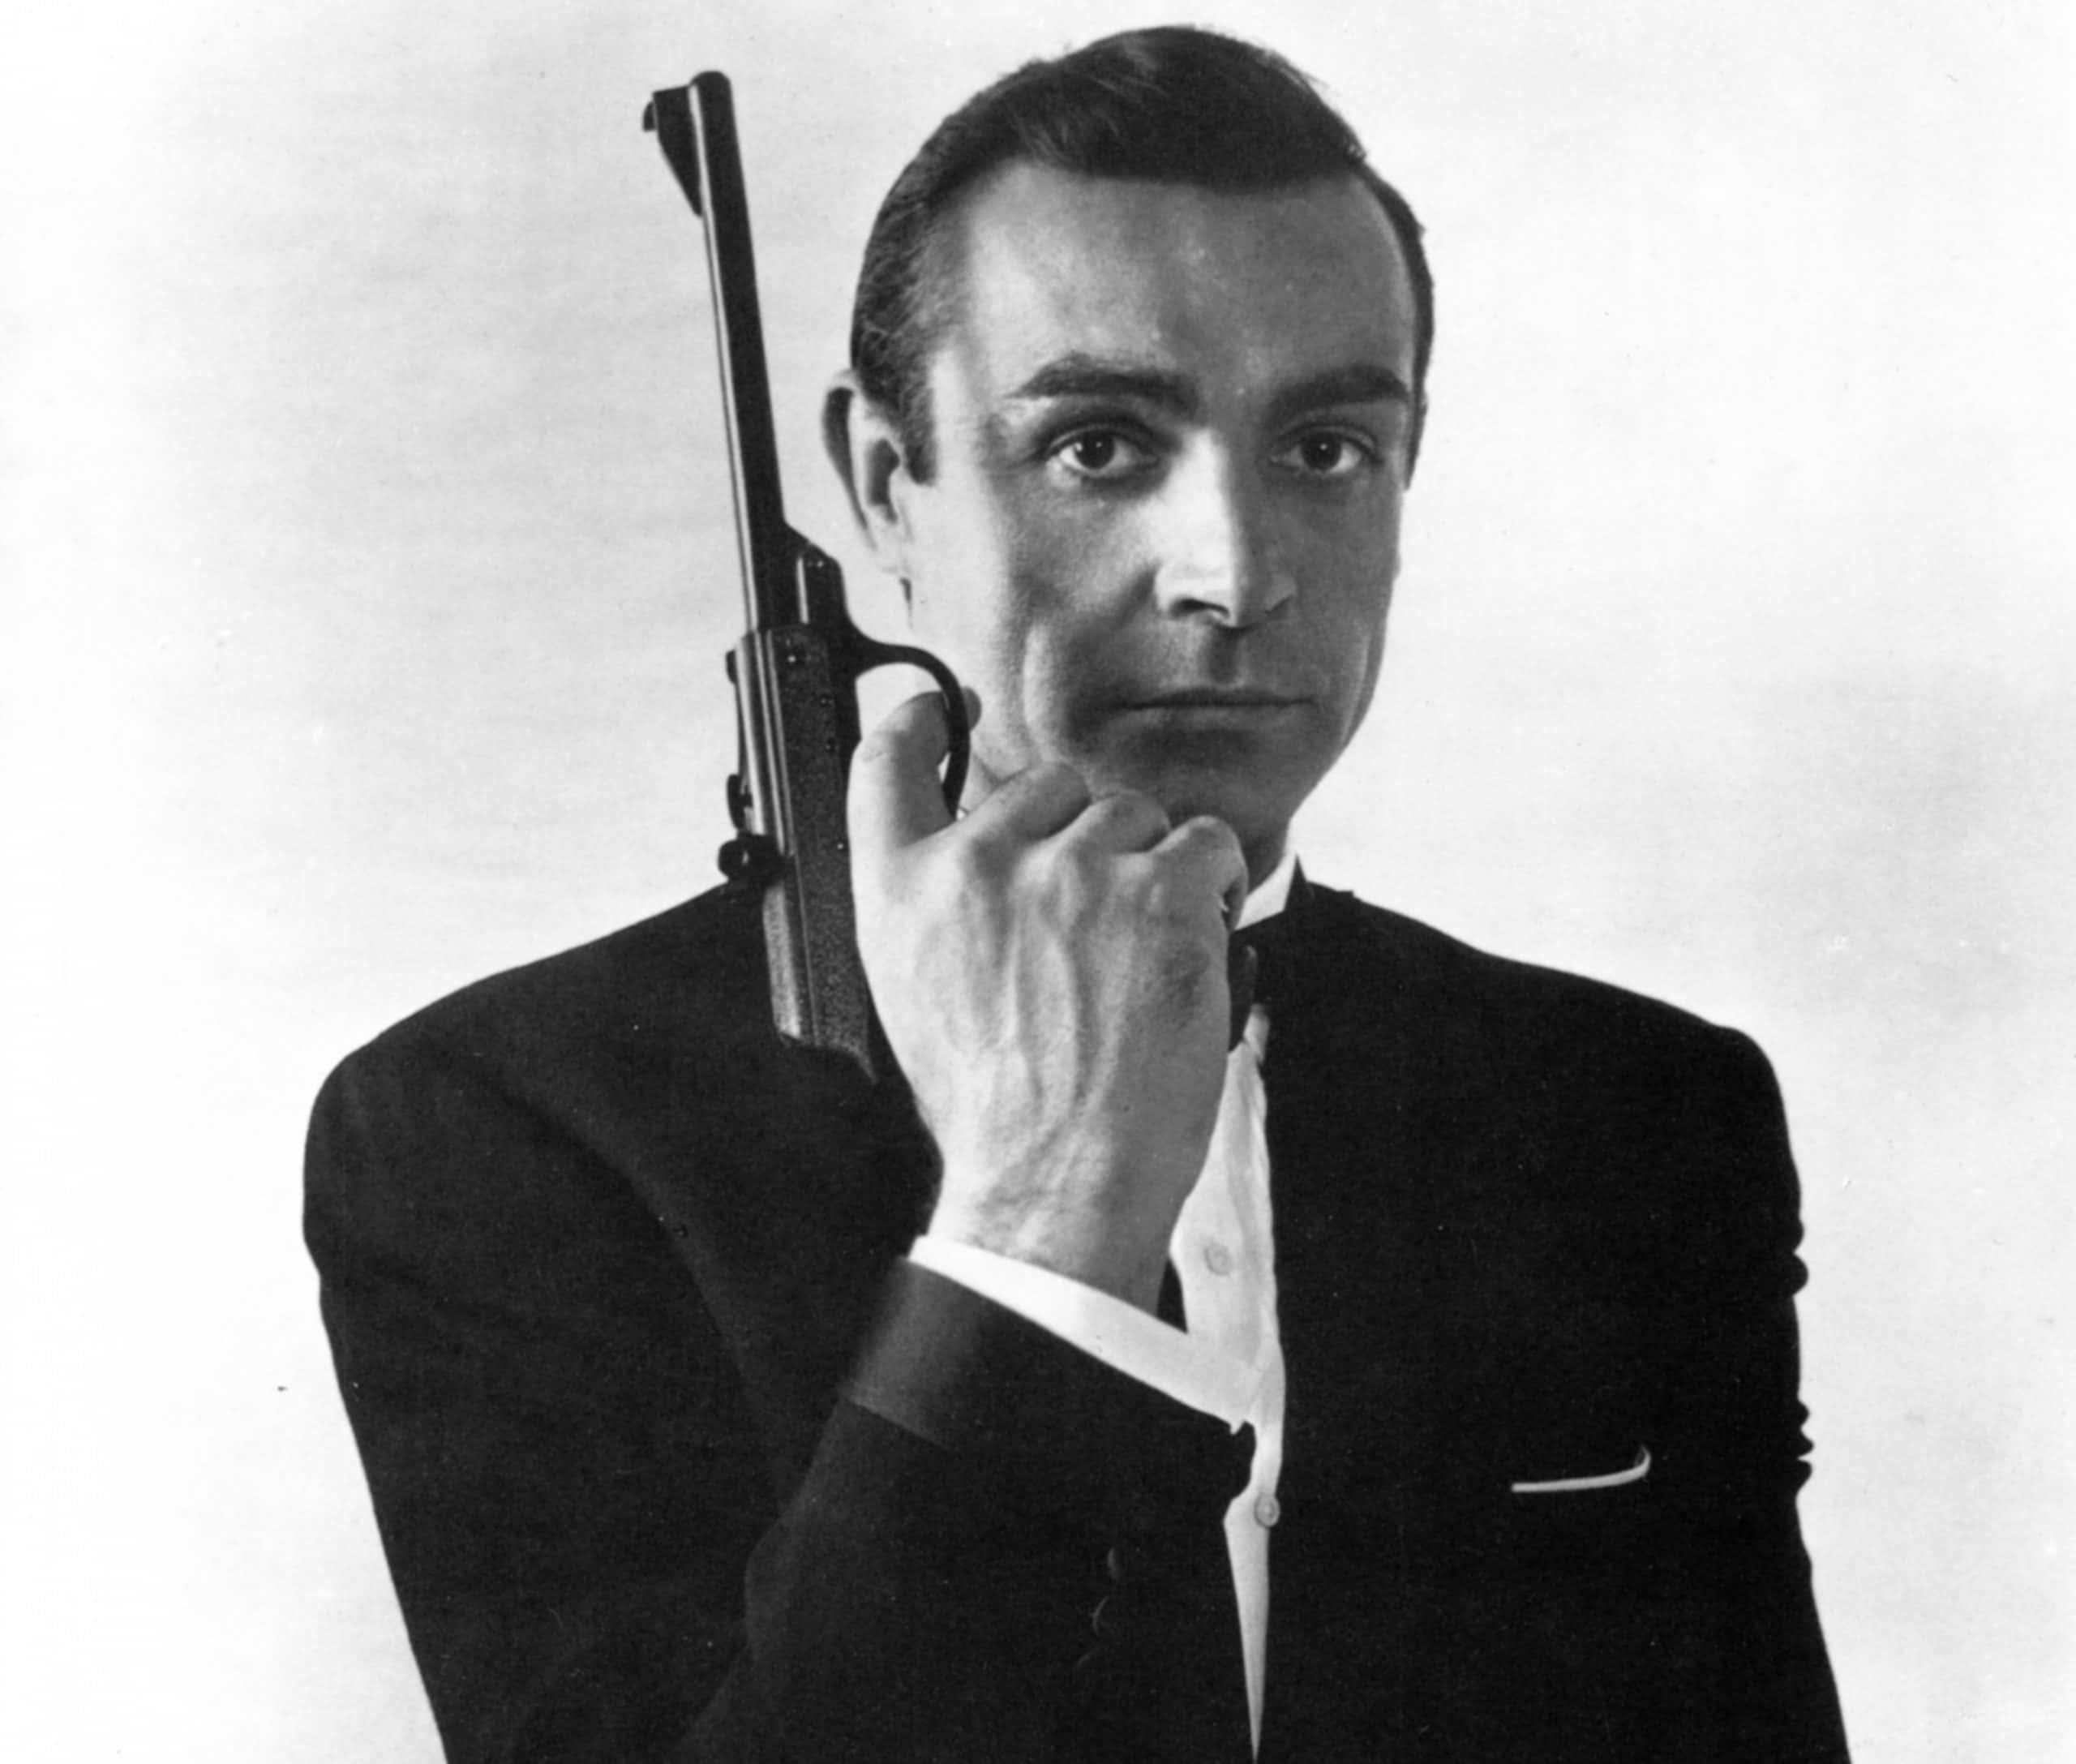 James Bond Facts